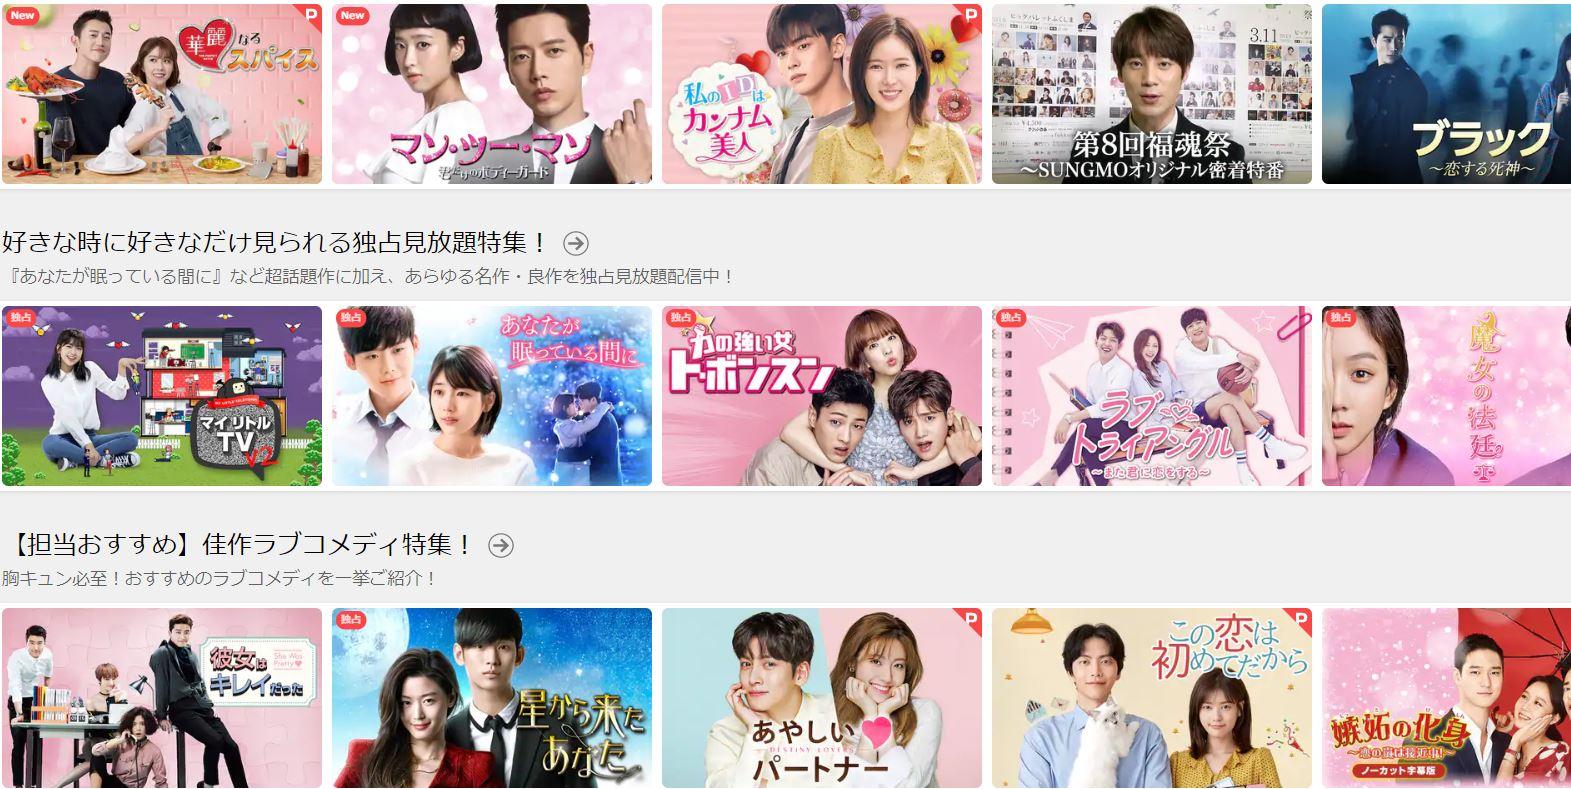 U-NEXTで見れる韓国ドラマ